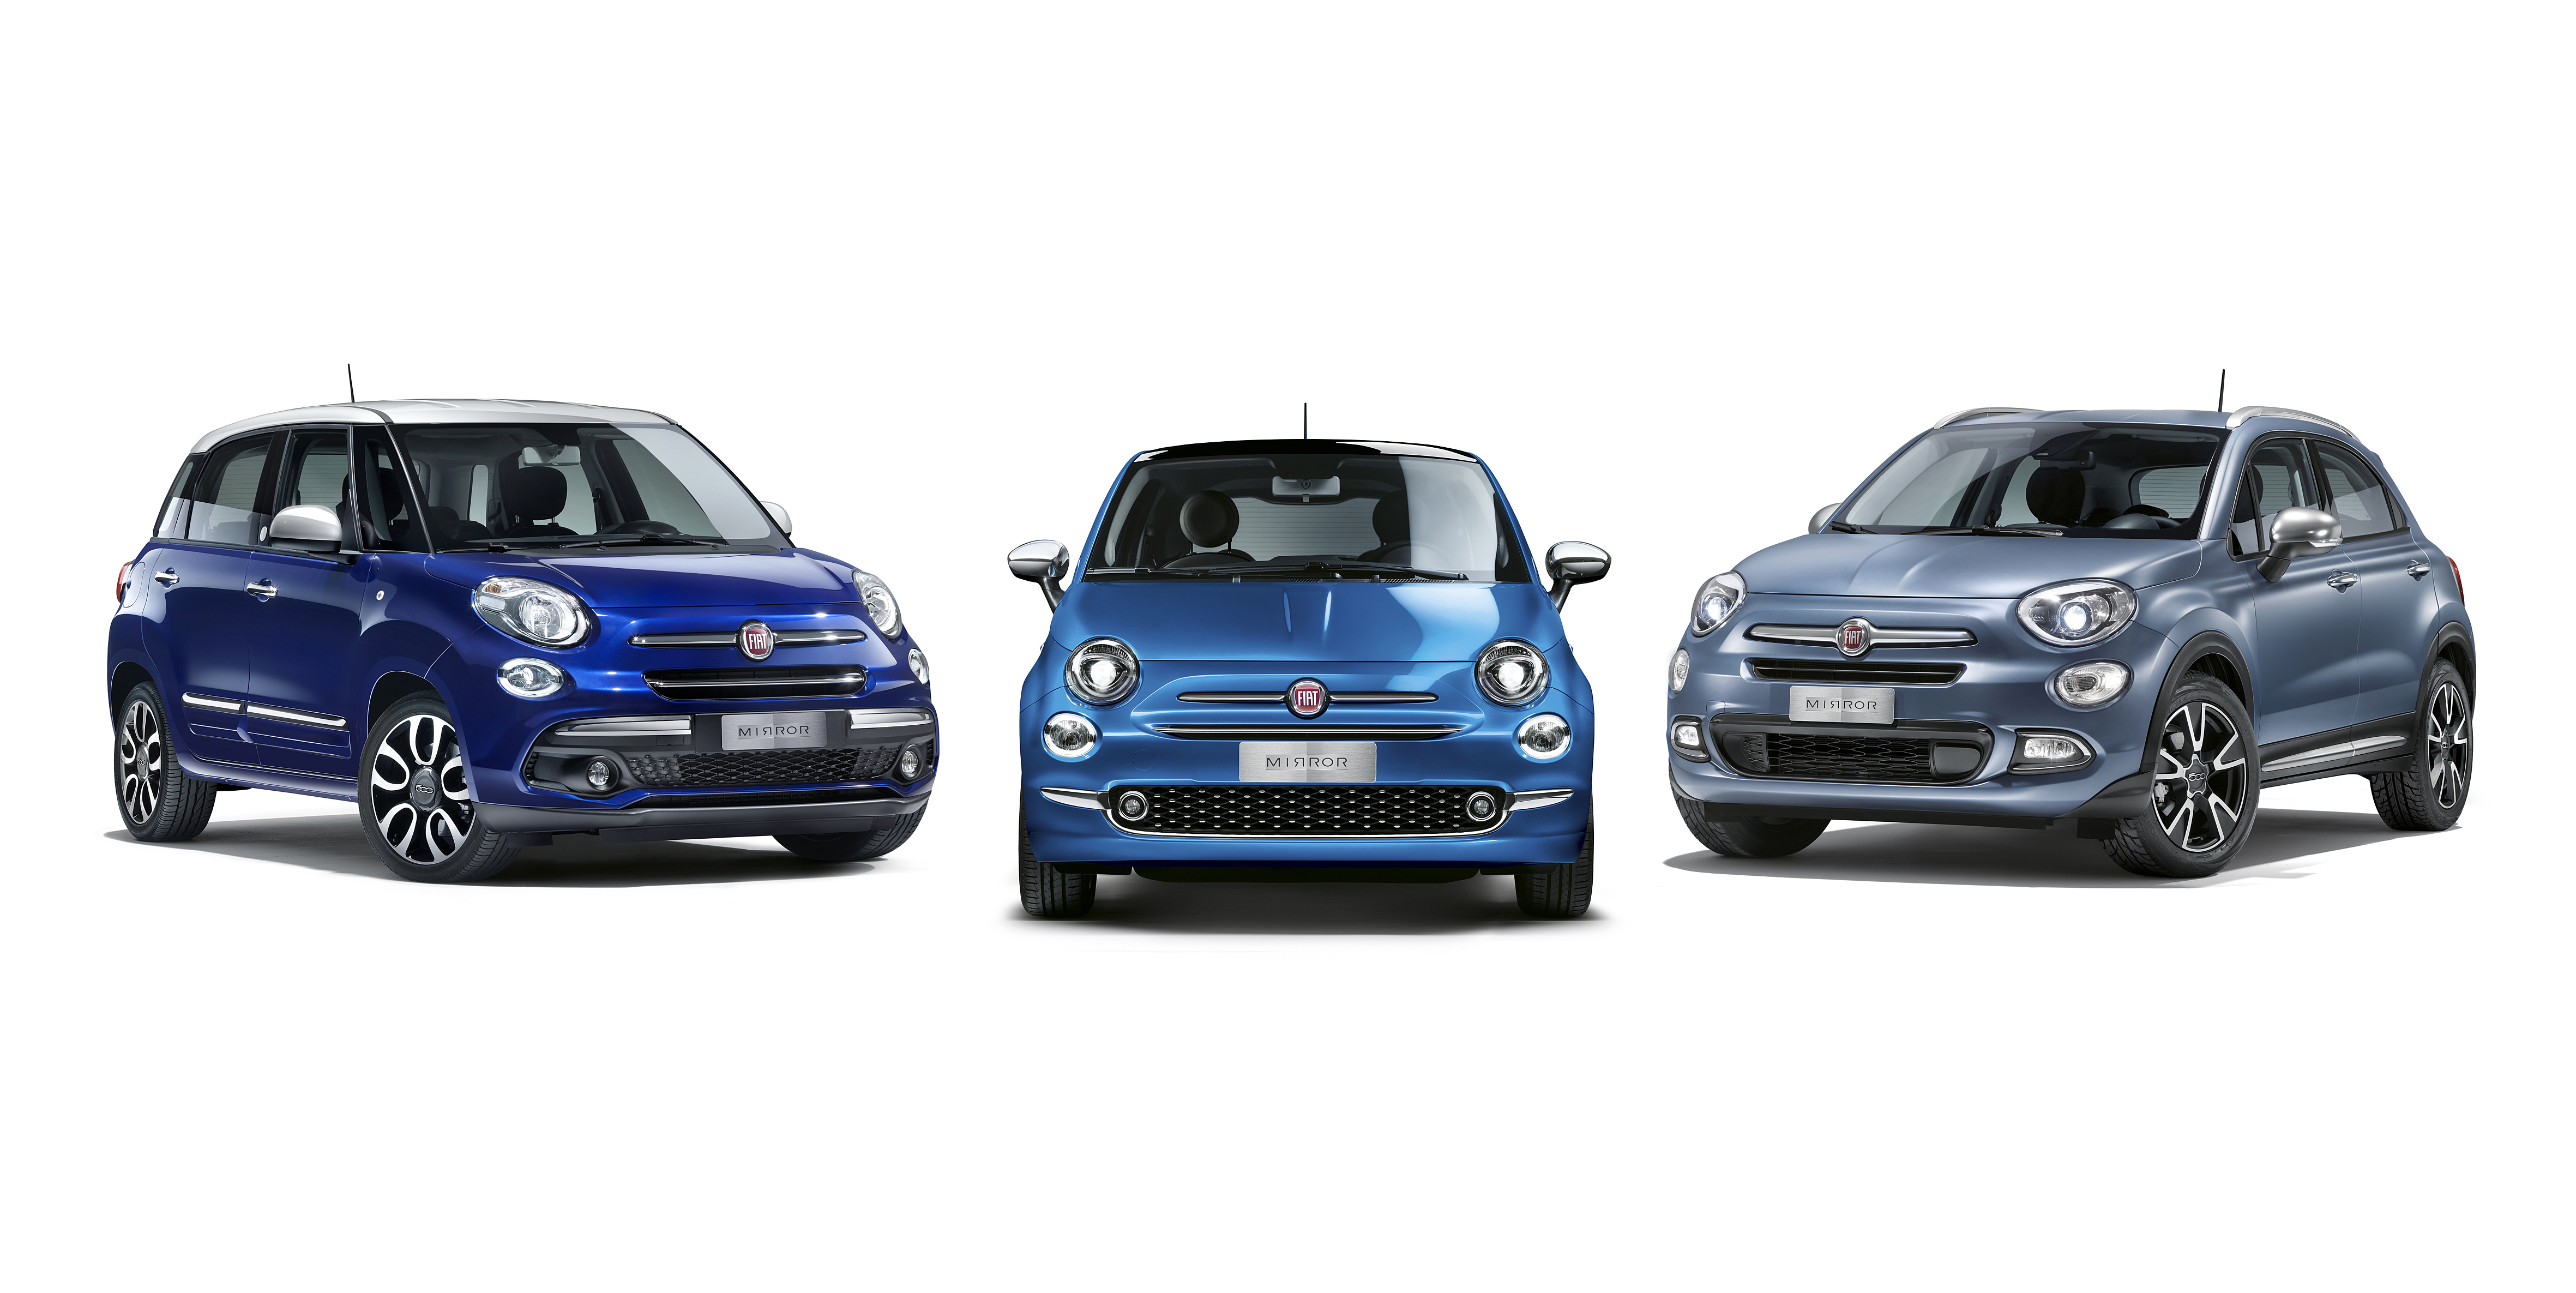 Fiat 500 Mirror.The New Fiat 500 Mirror Family Press Fiat Group